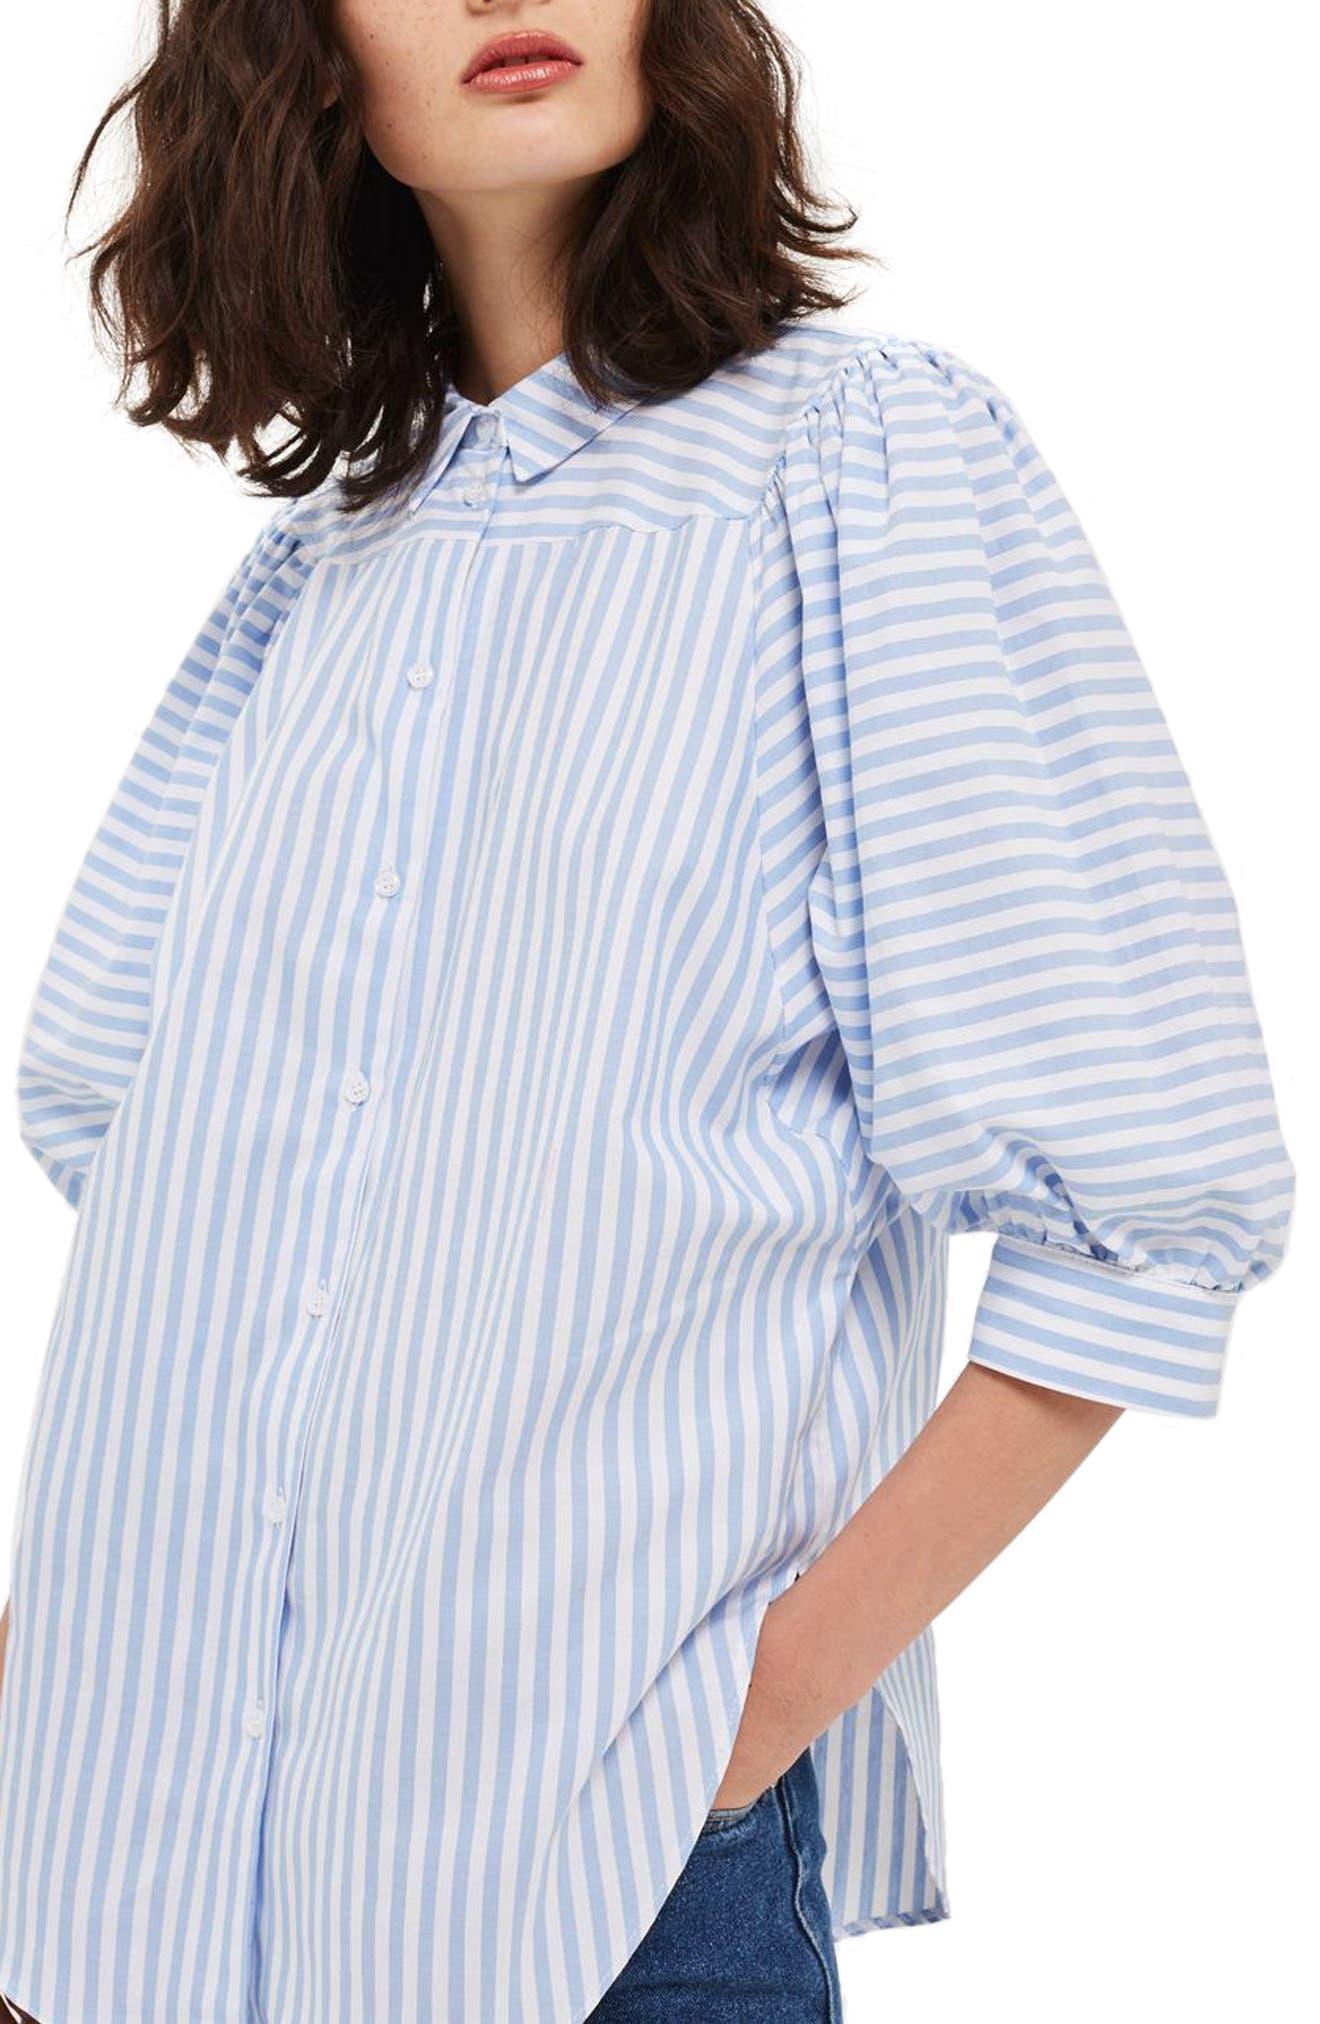 Topshop Stripe Puff Sleeve Shirt